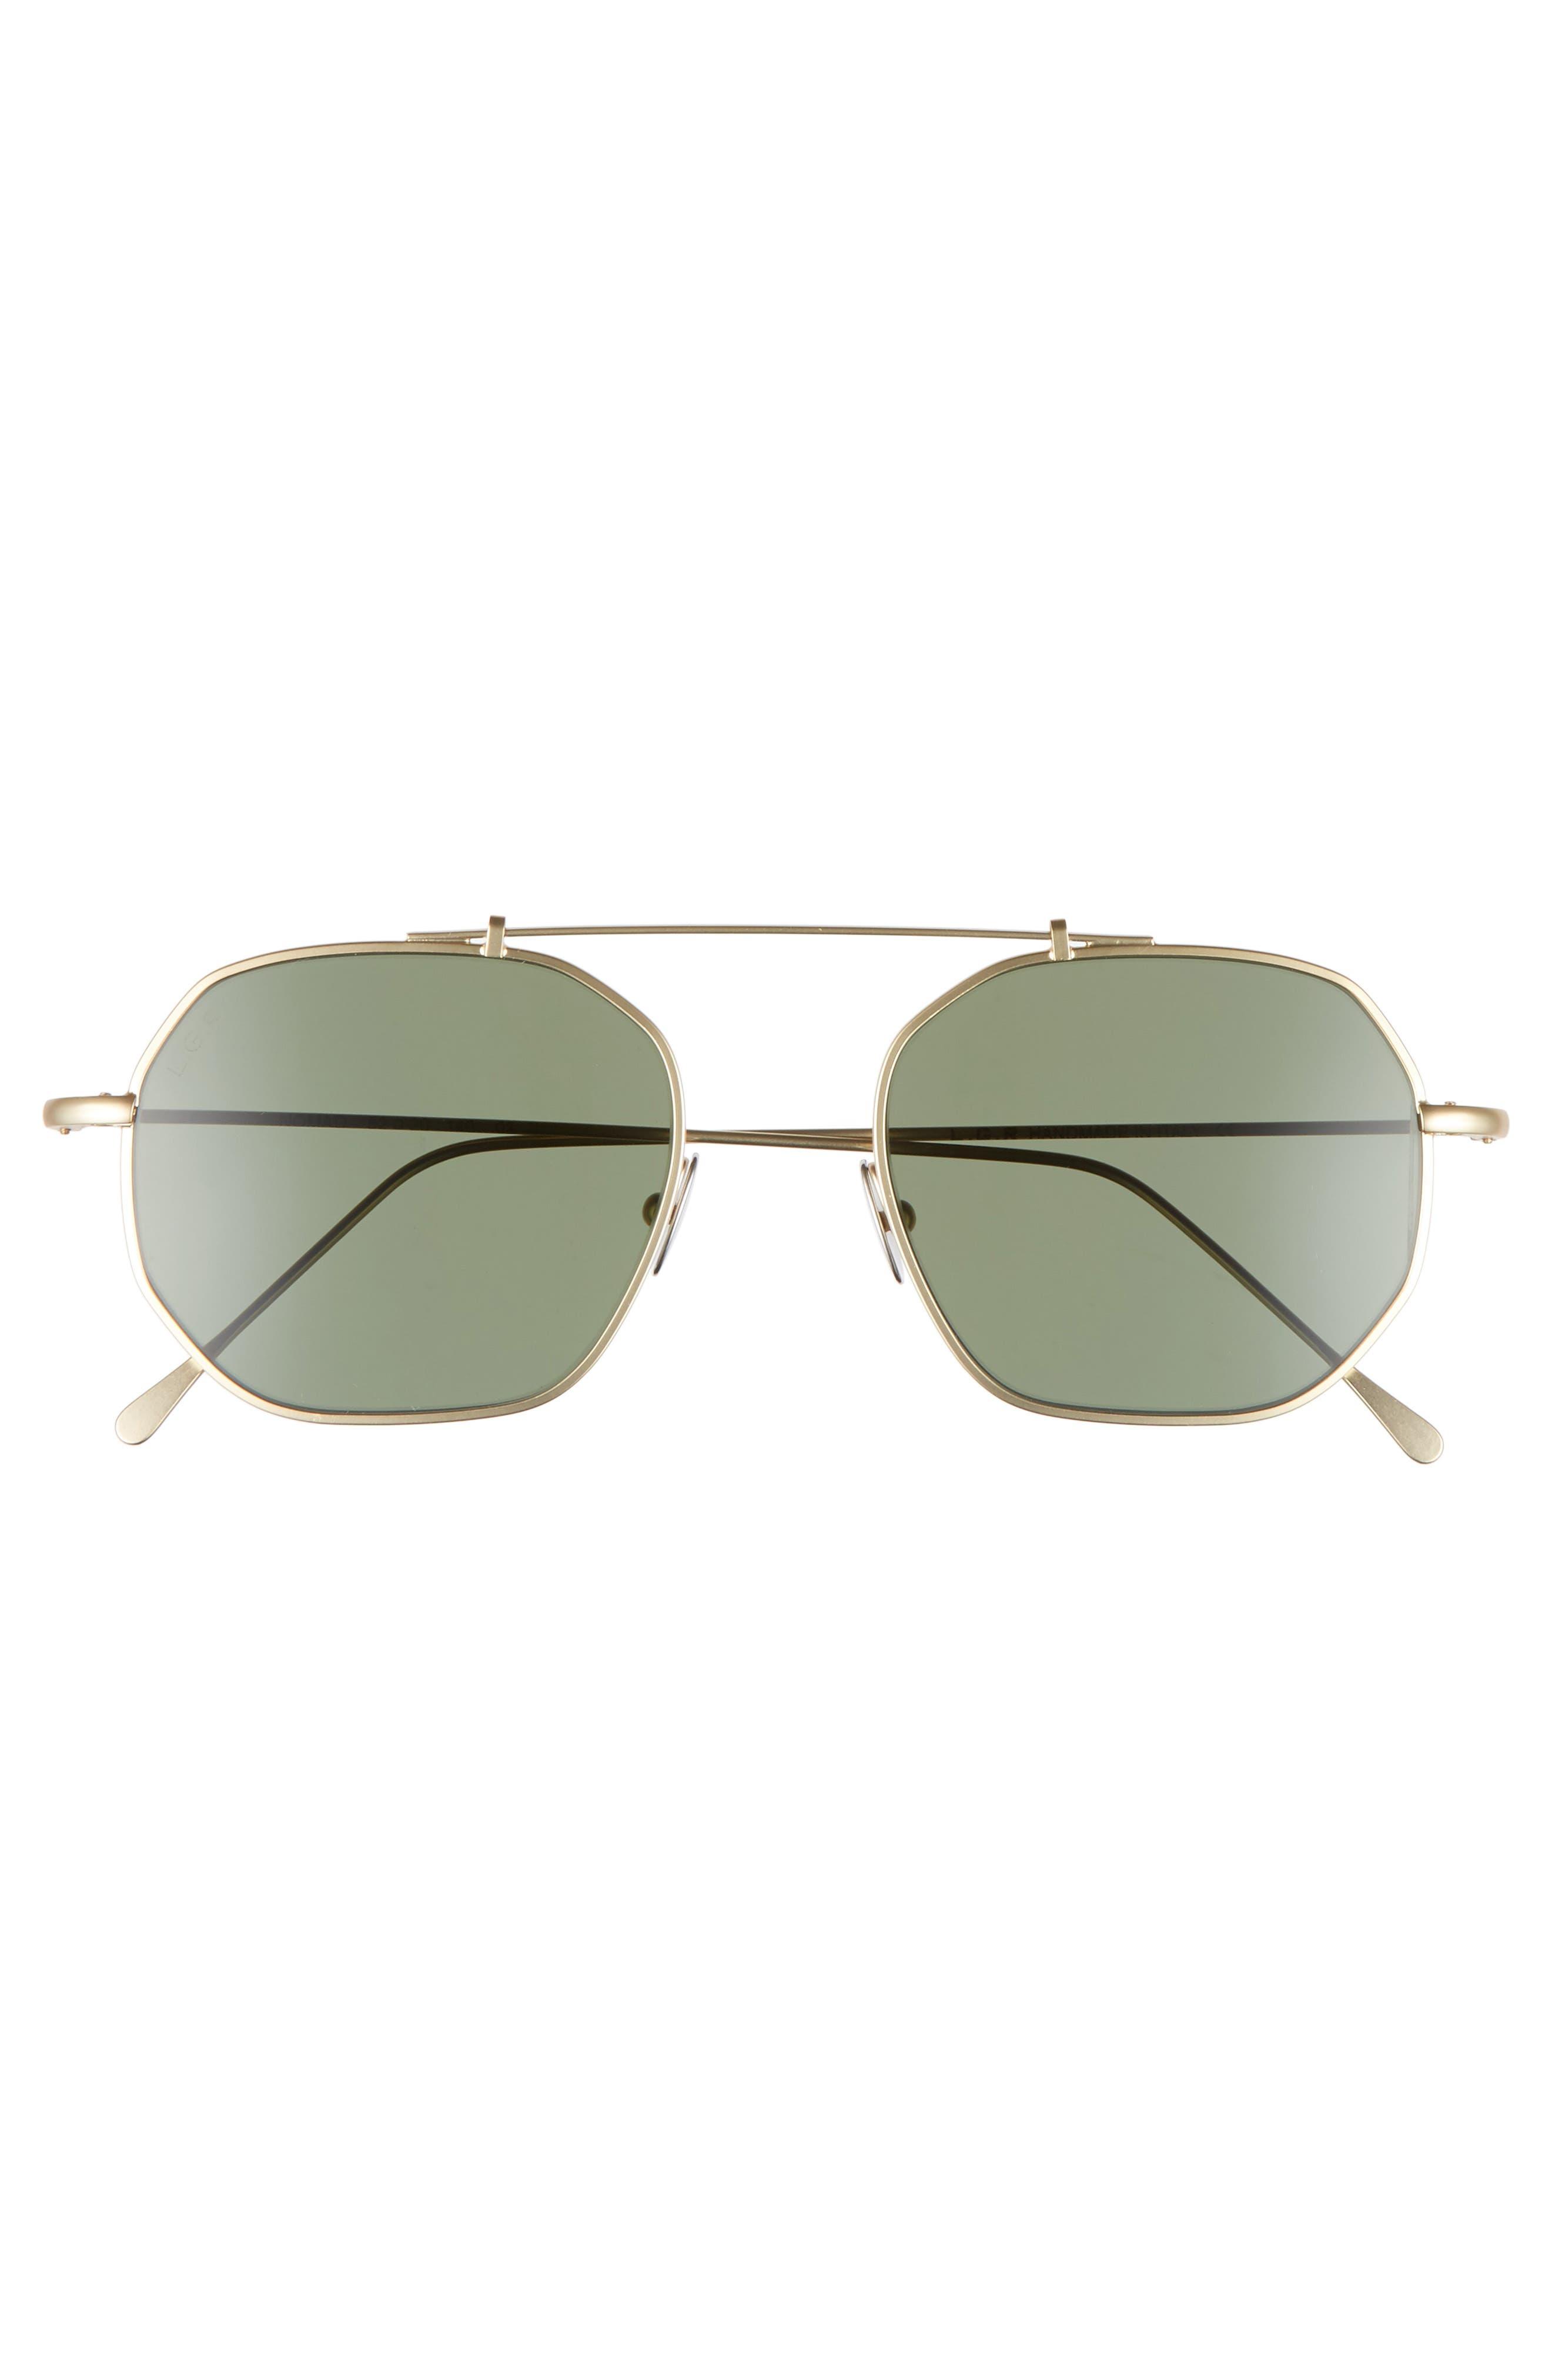 Nomad 52mm Sunglasses,                             Alternate thumbnail 4, color,